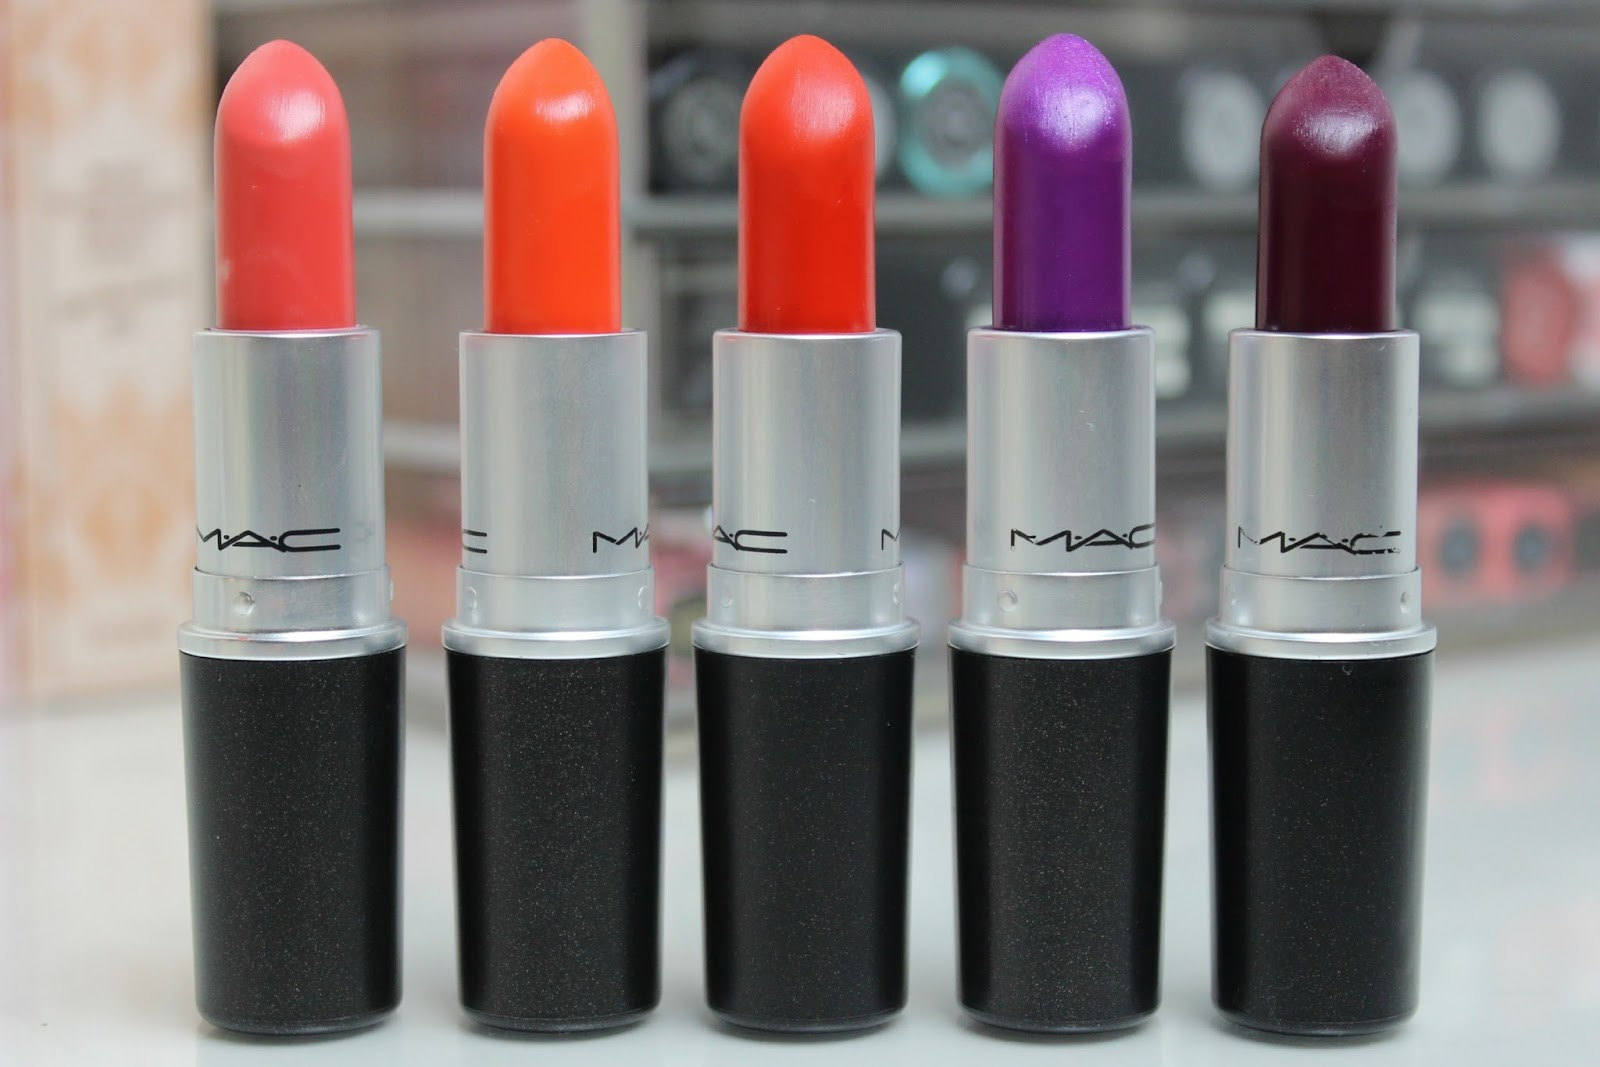 A picture of MAC lipsticks in shades Vegas Volt, Morange, Lady Danger, Violetta and Rebel